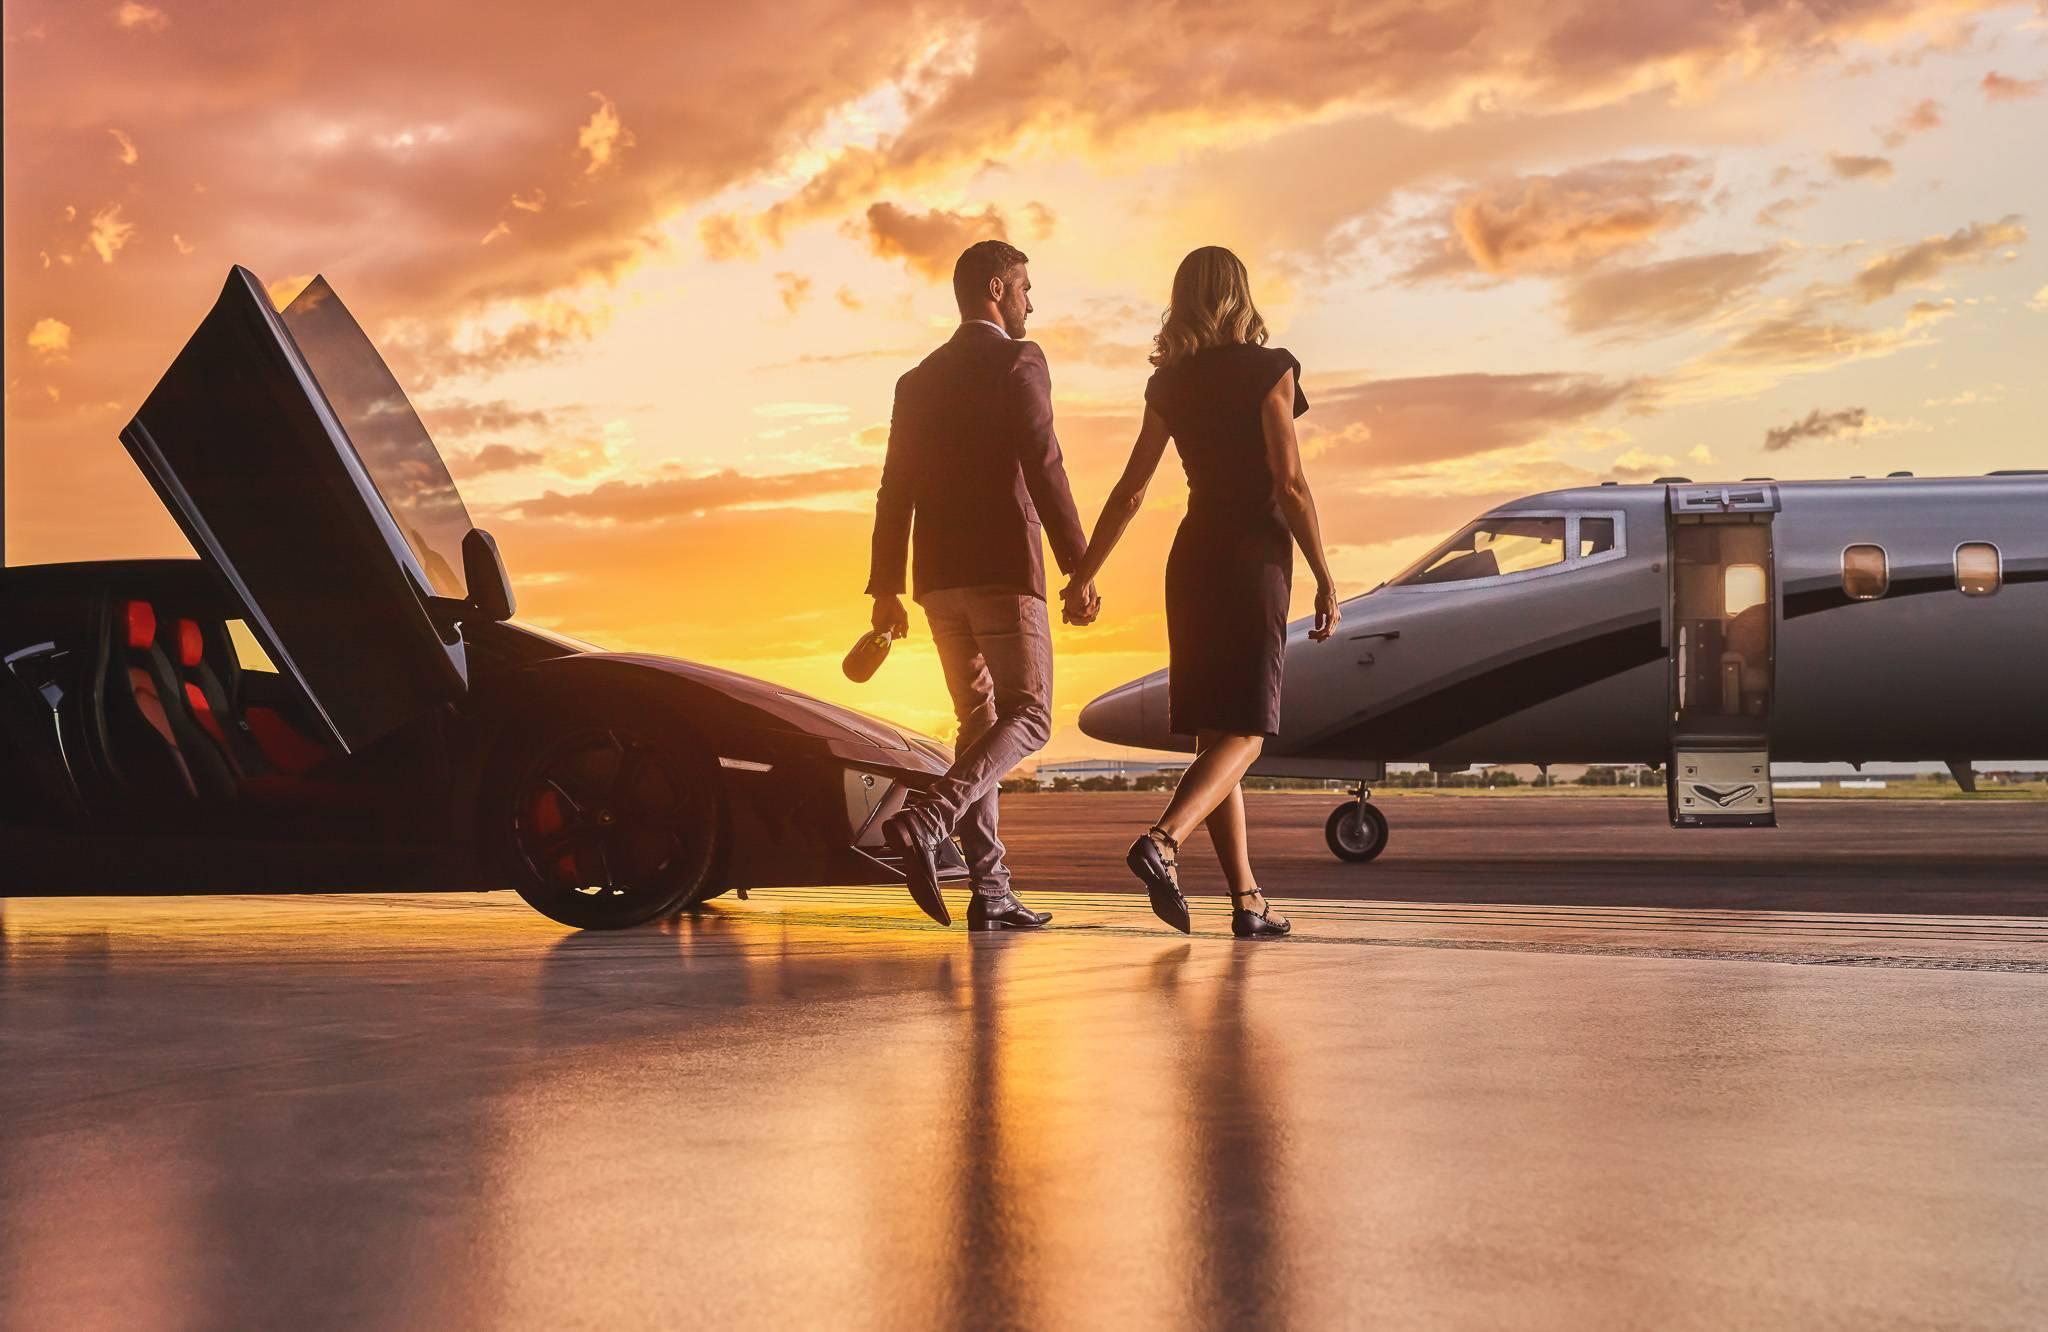 lamborghini business private jet married couple 23 1